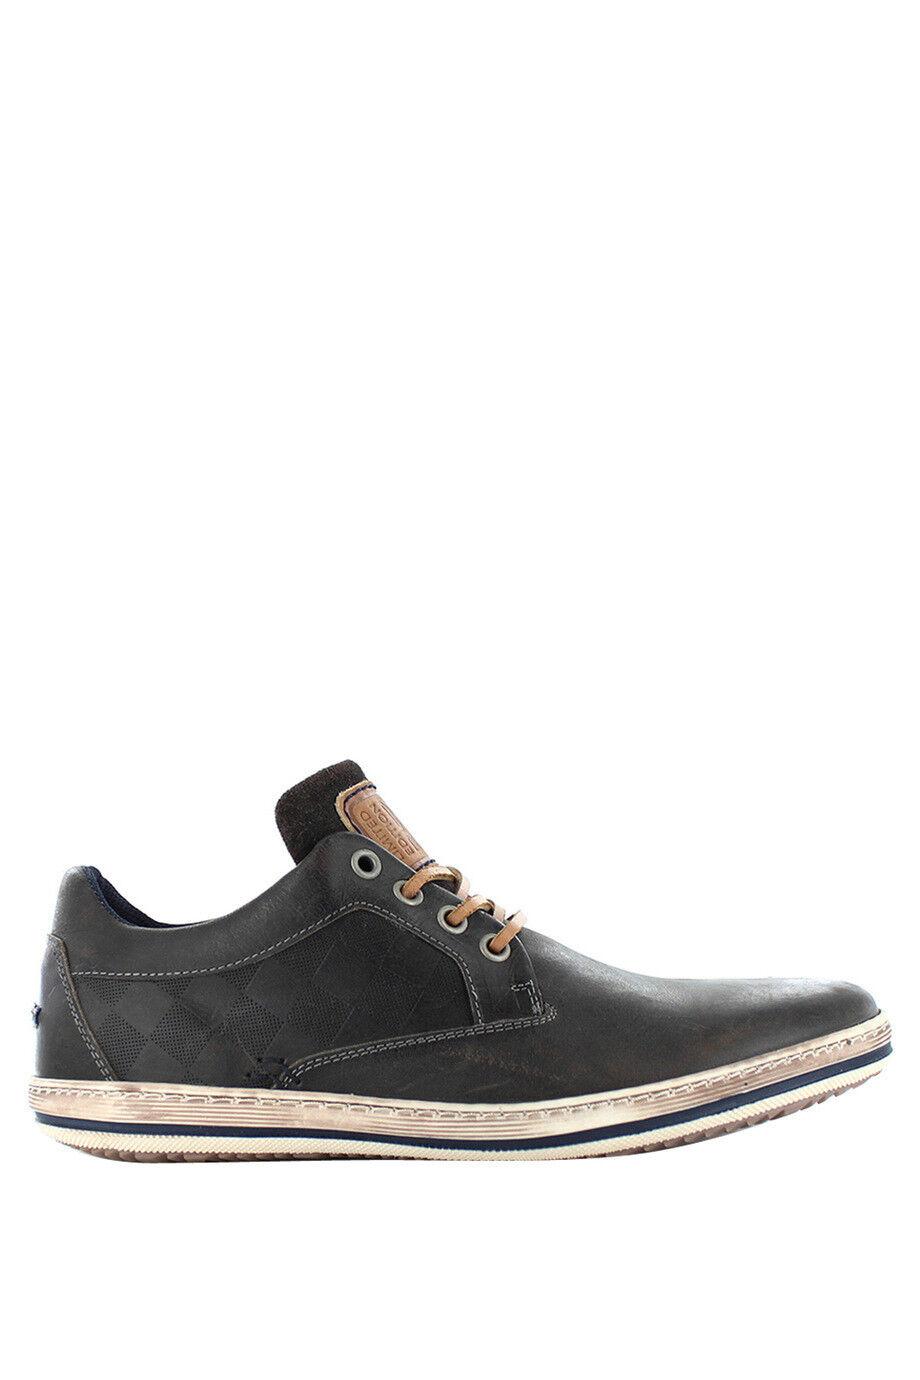 NEW Wild Rhino Cooper Leather Sneaker Grey